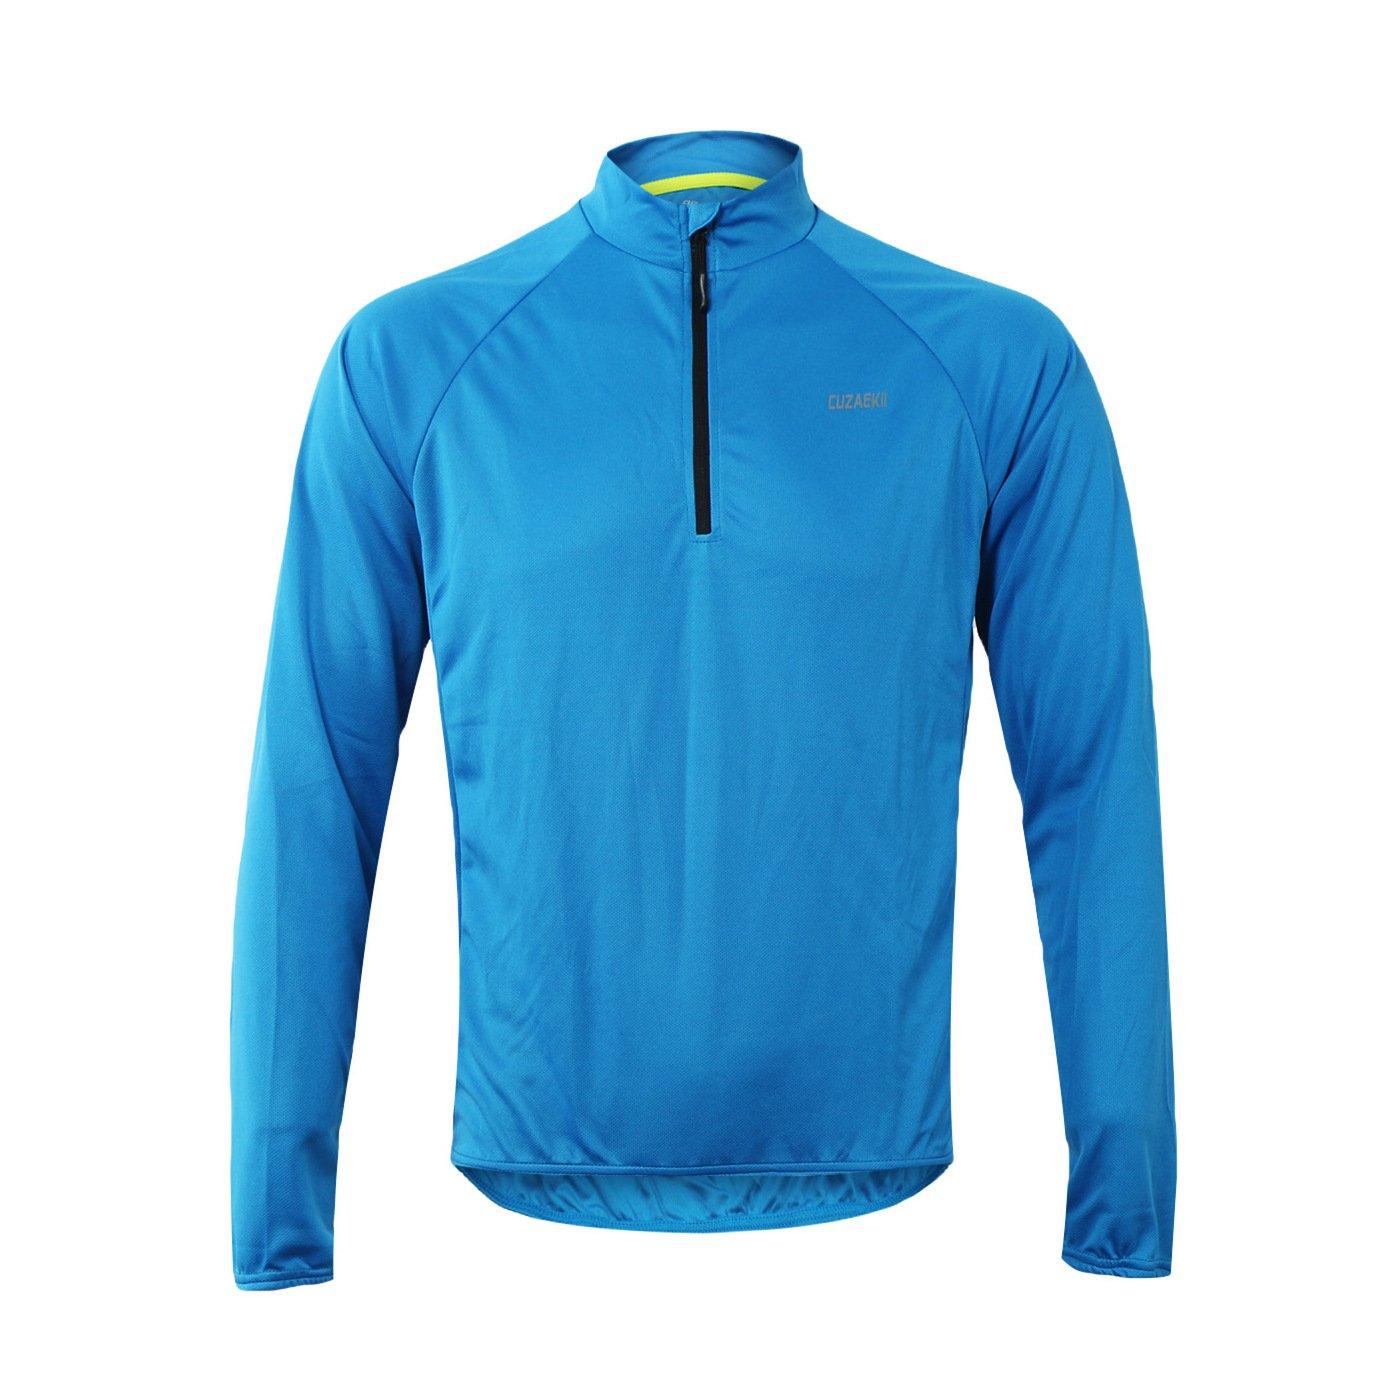 Cuzaekii Herren Lange Ärmel Cycling Jersey MTB Bike Shirt Kleidung für Sommer & Cool Wetter